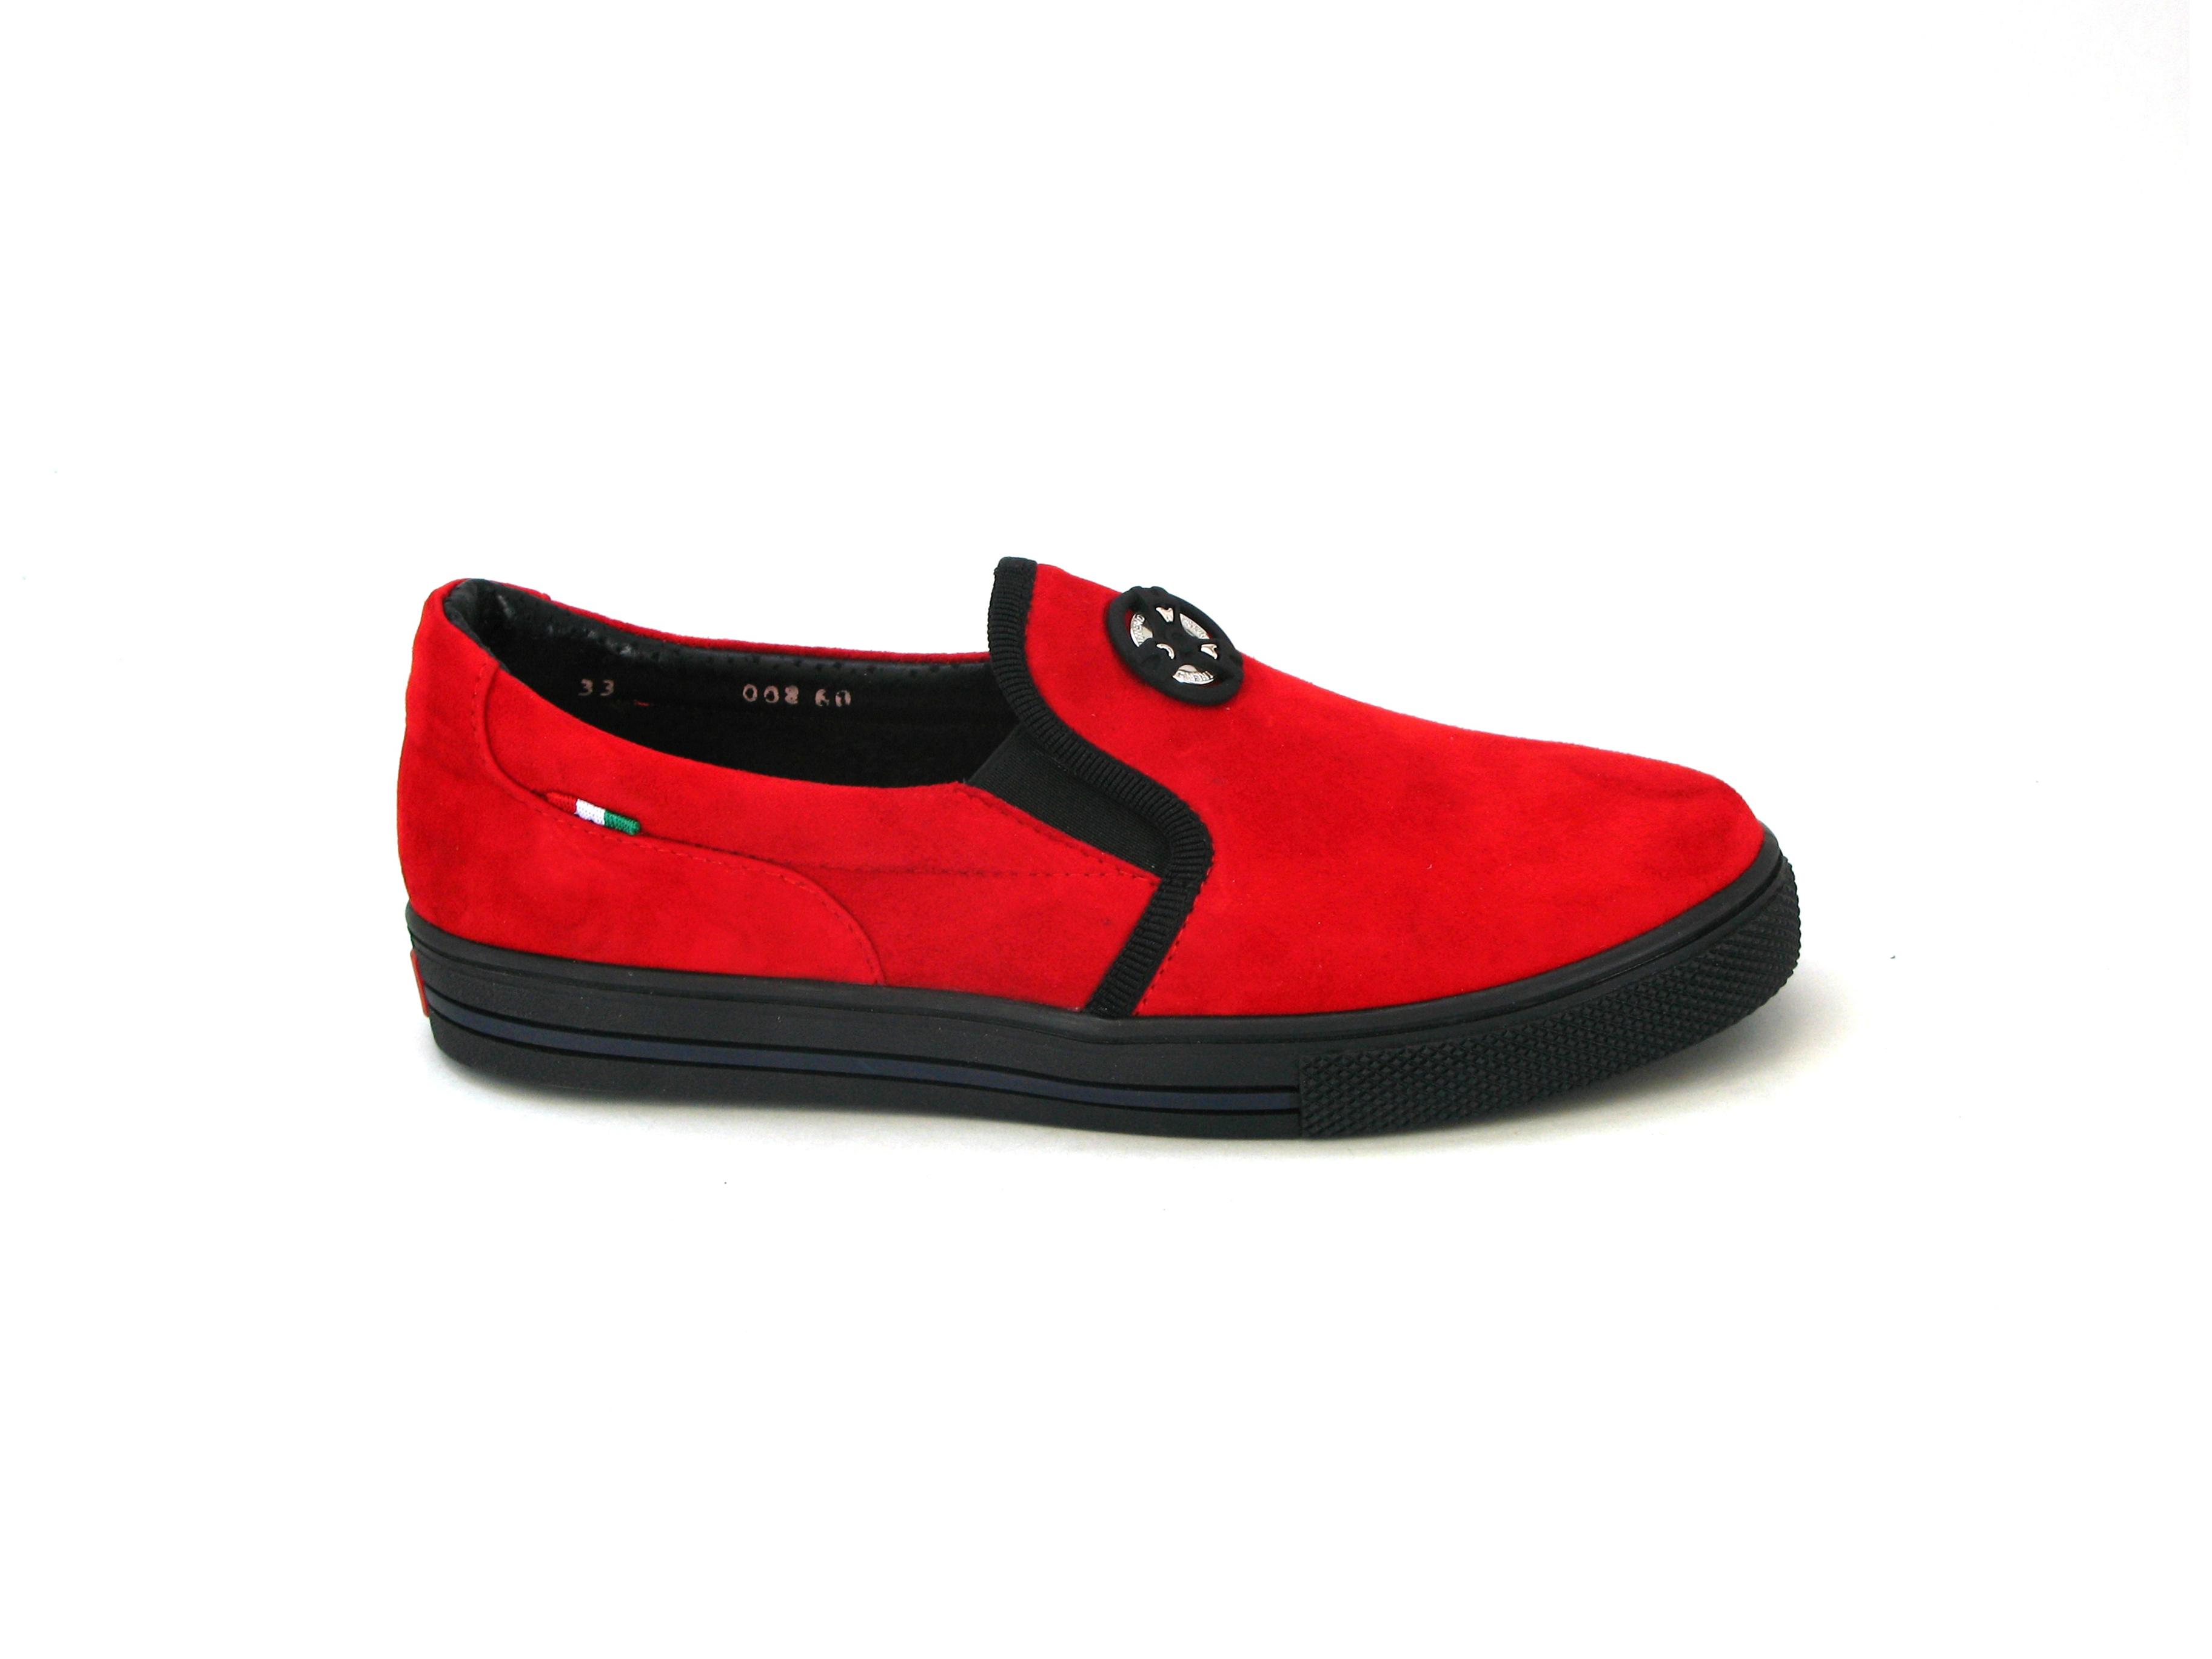 6a5a5f3c643e7e Туфлі Giorgio Vito купити в Ужгороді - Товари - Брендове взуття ...